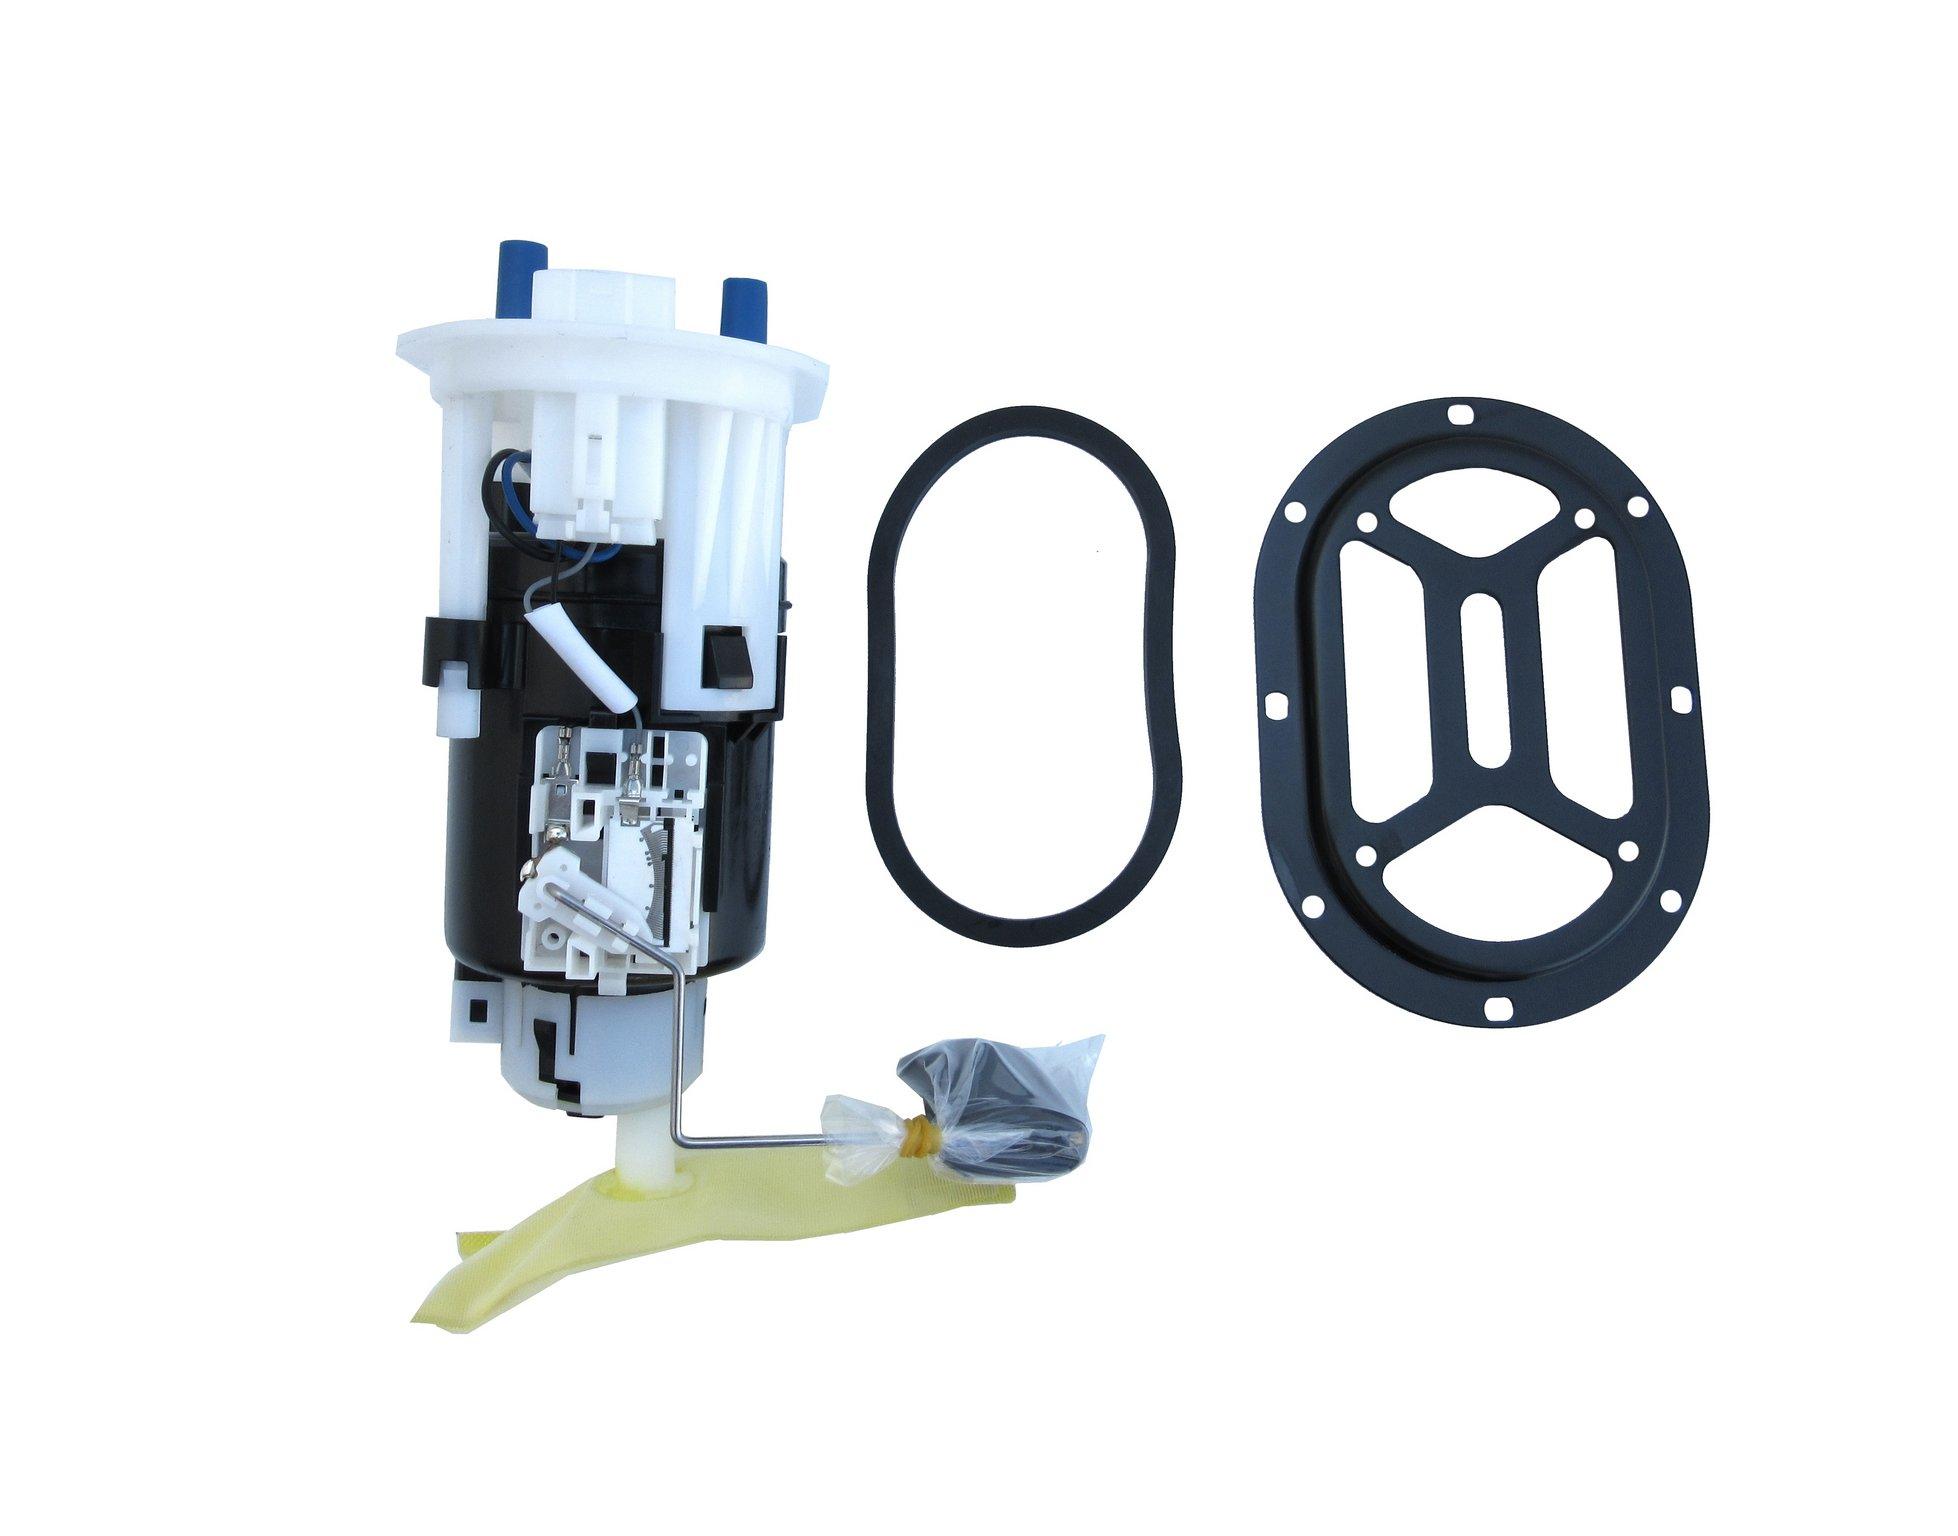 hight resolution of  2004 hyundai santa fe fuel pump module assembly a0 f4674a